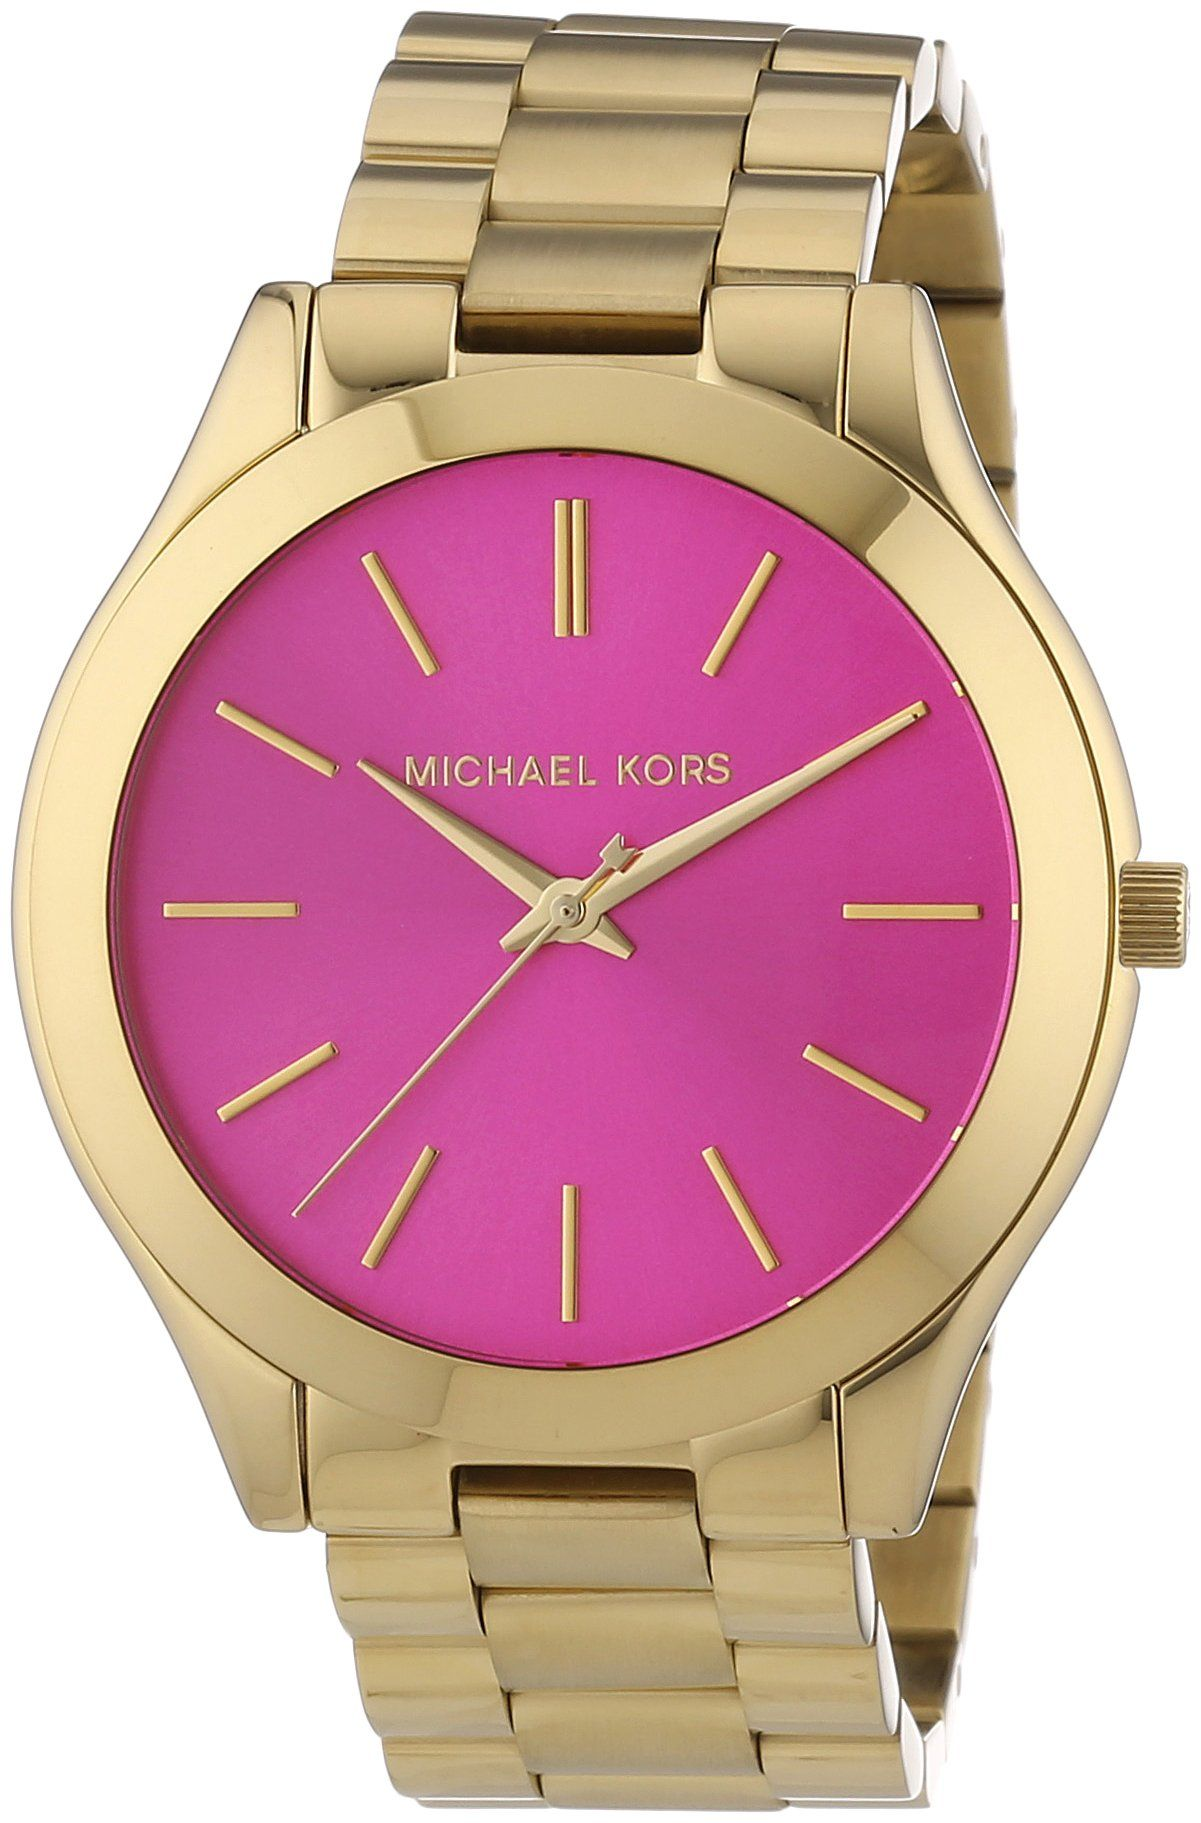 a1f0985d3ba0 Michael Kors MK3264 - Reloj de cuarzo para mujer